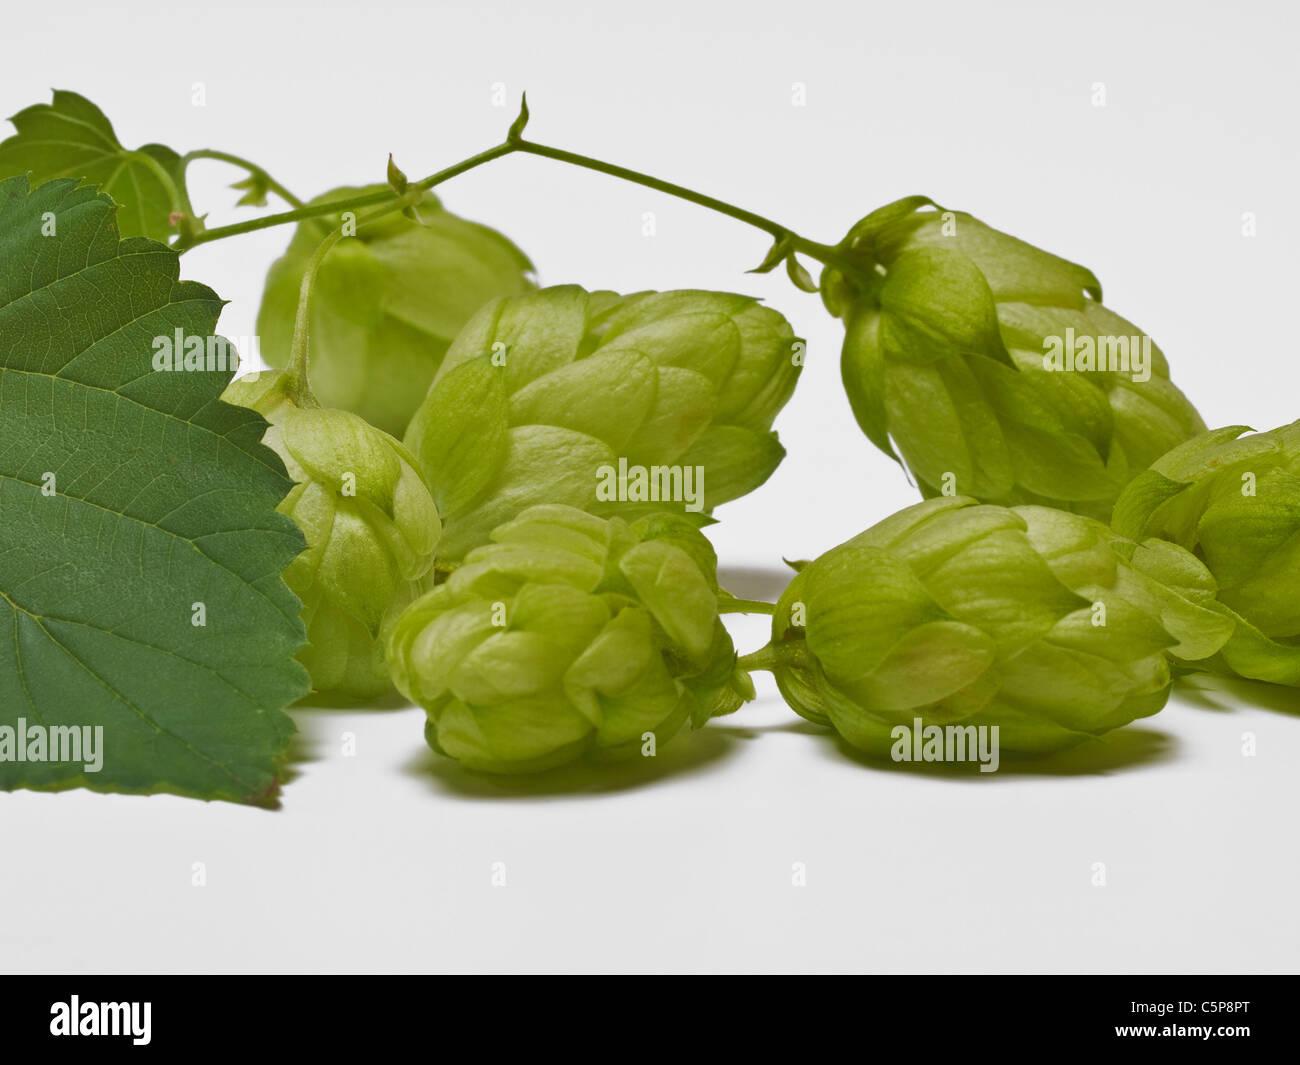 Detailansicht einer Hopfenpflanze | Detail photo of a hop plant - Stock Image